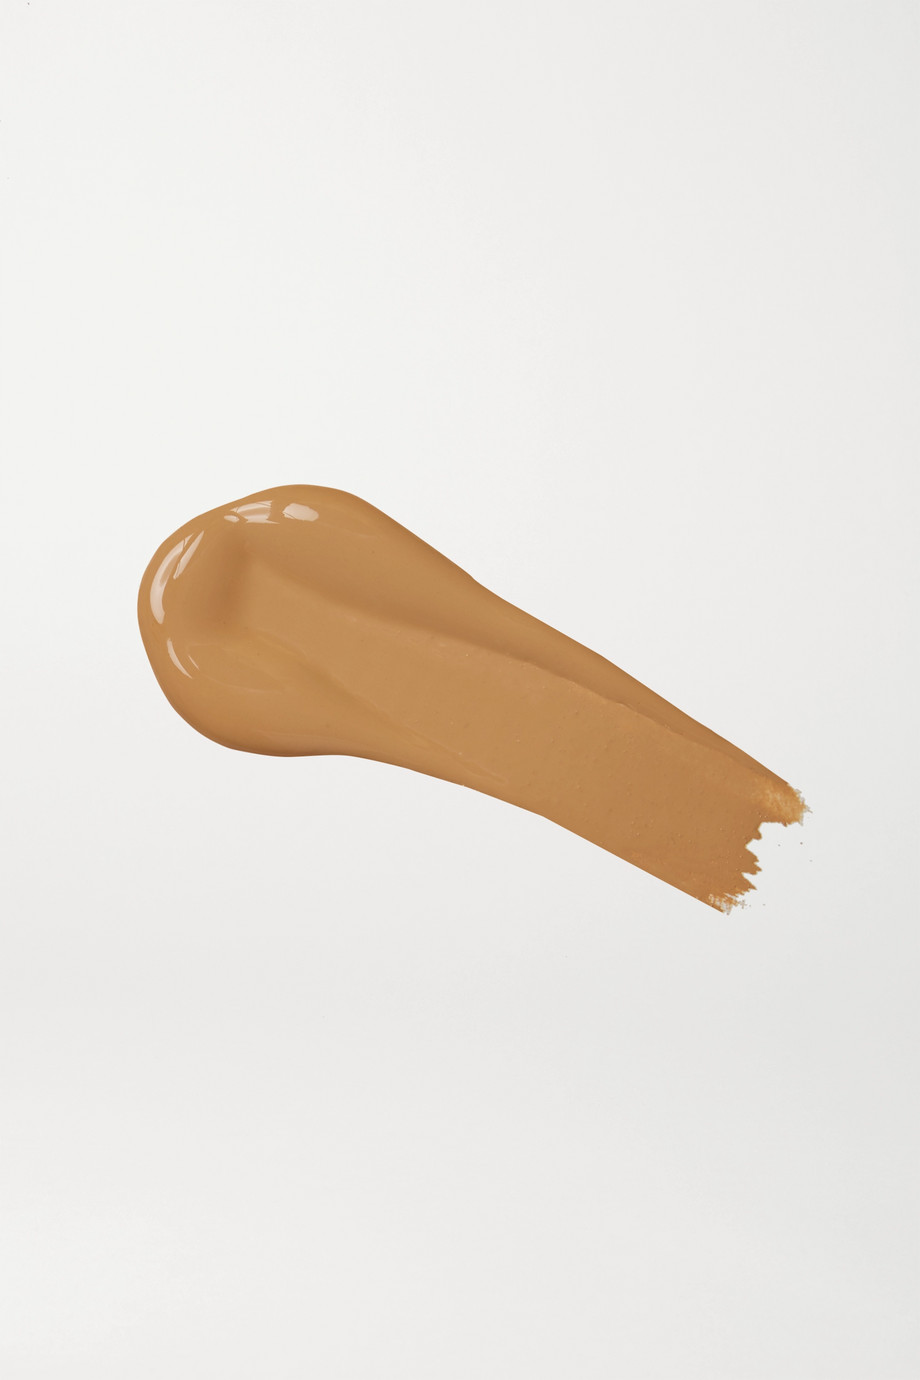 Kosas Revealer Super Creamy + Brightening Concealer - 6.5